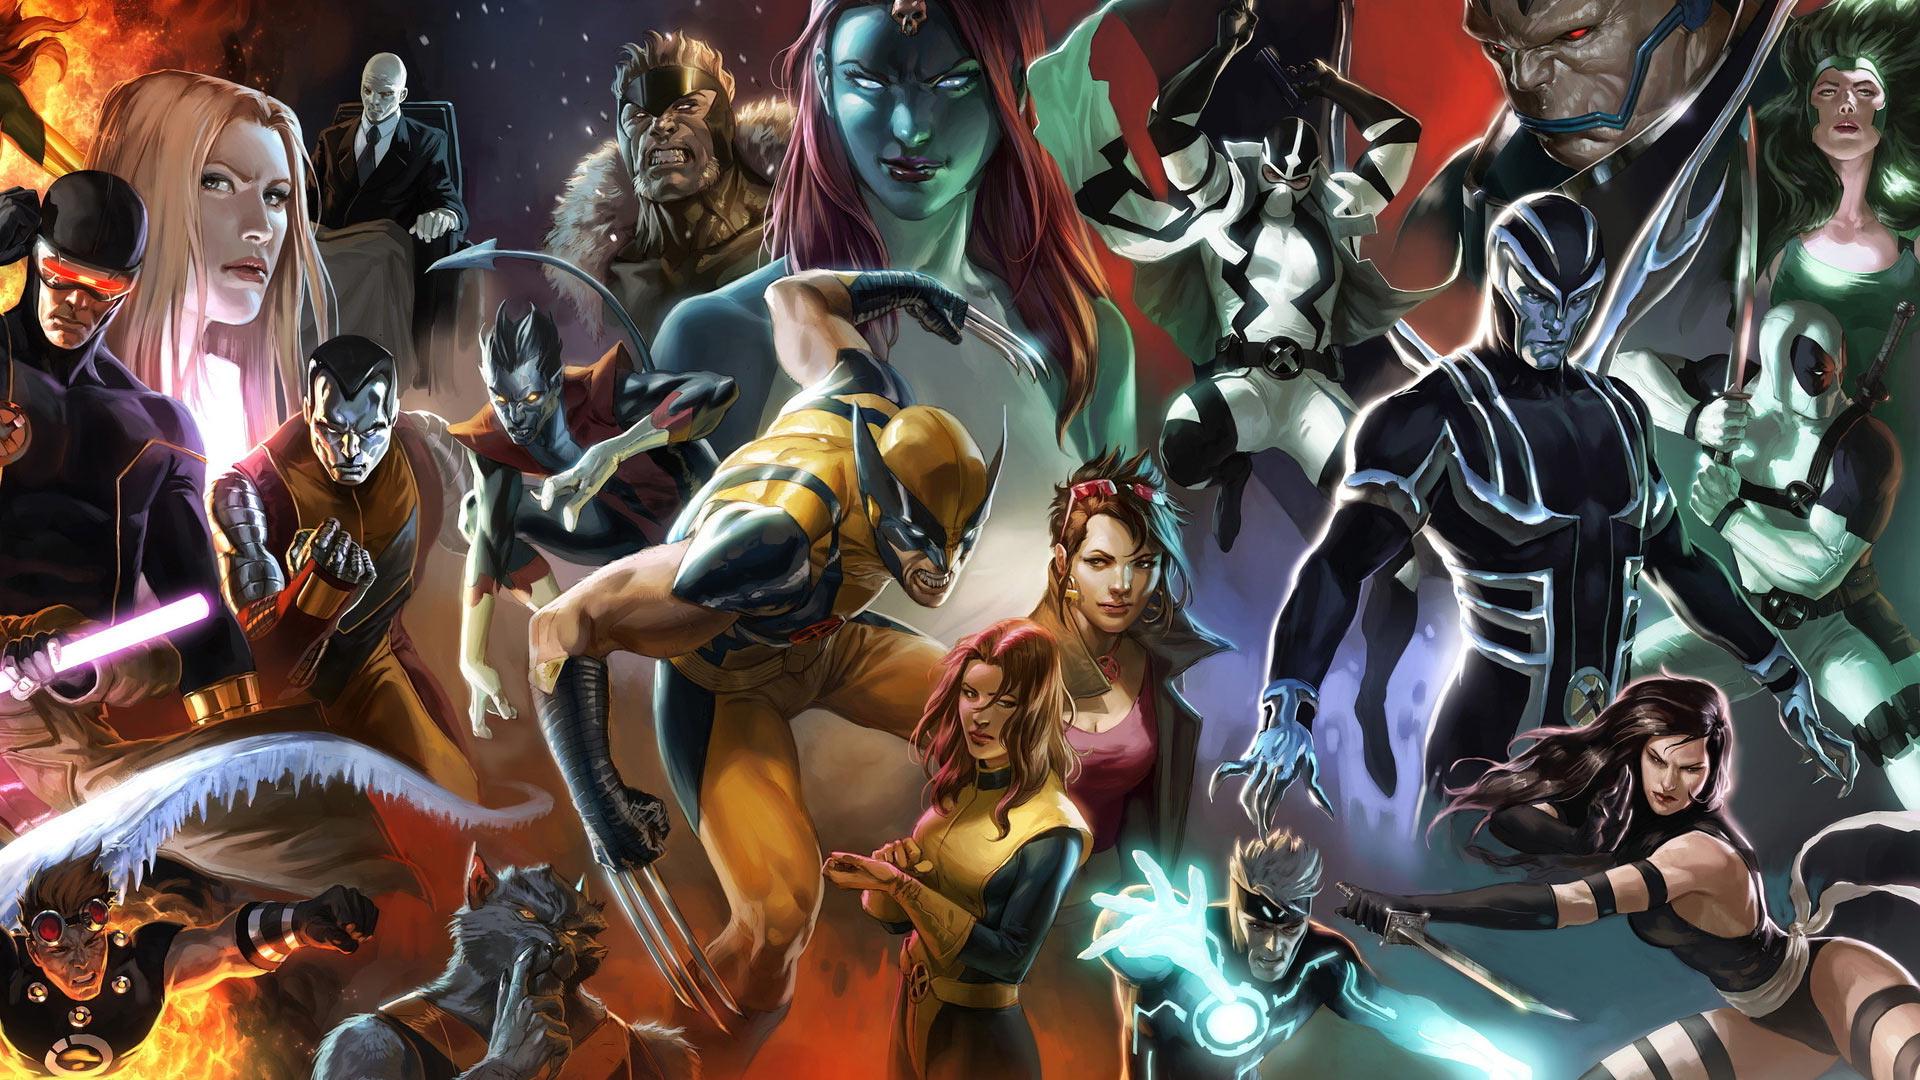 Картинки подборка супергероев